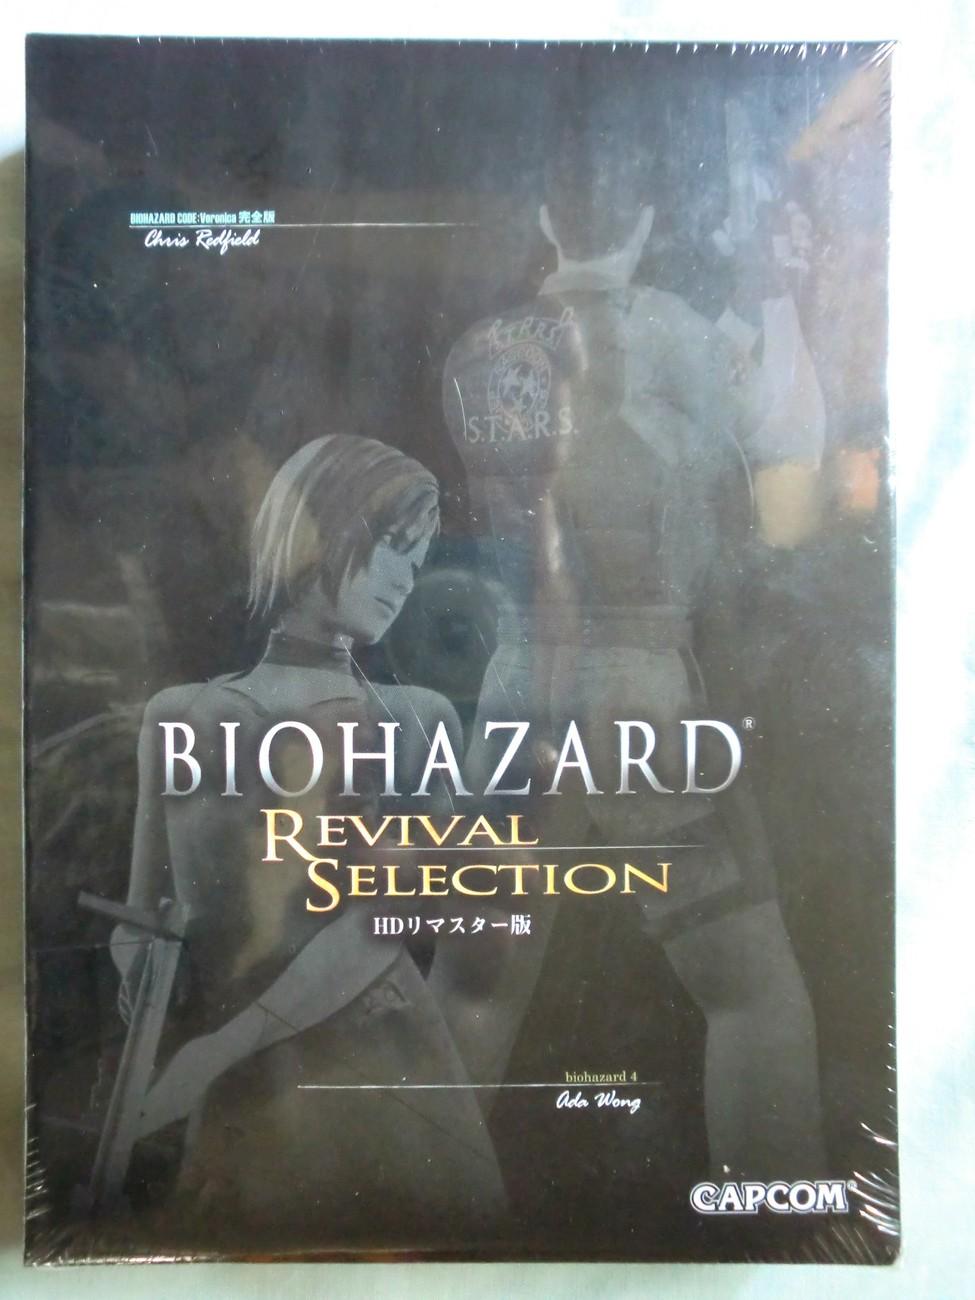 Biohazard: Revival Selection Premium Edition xbox 360 game